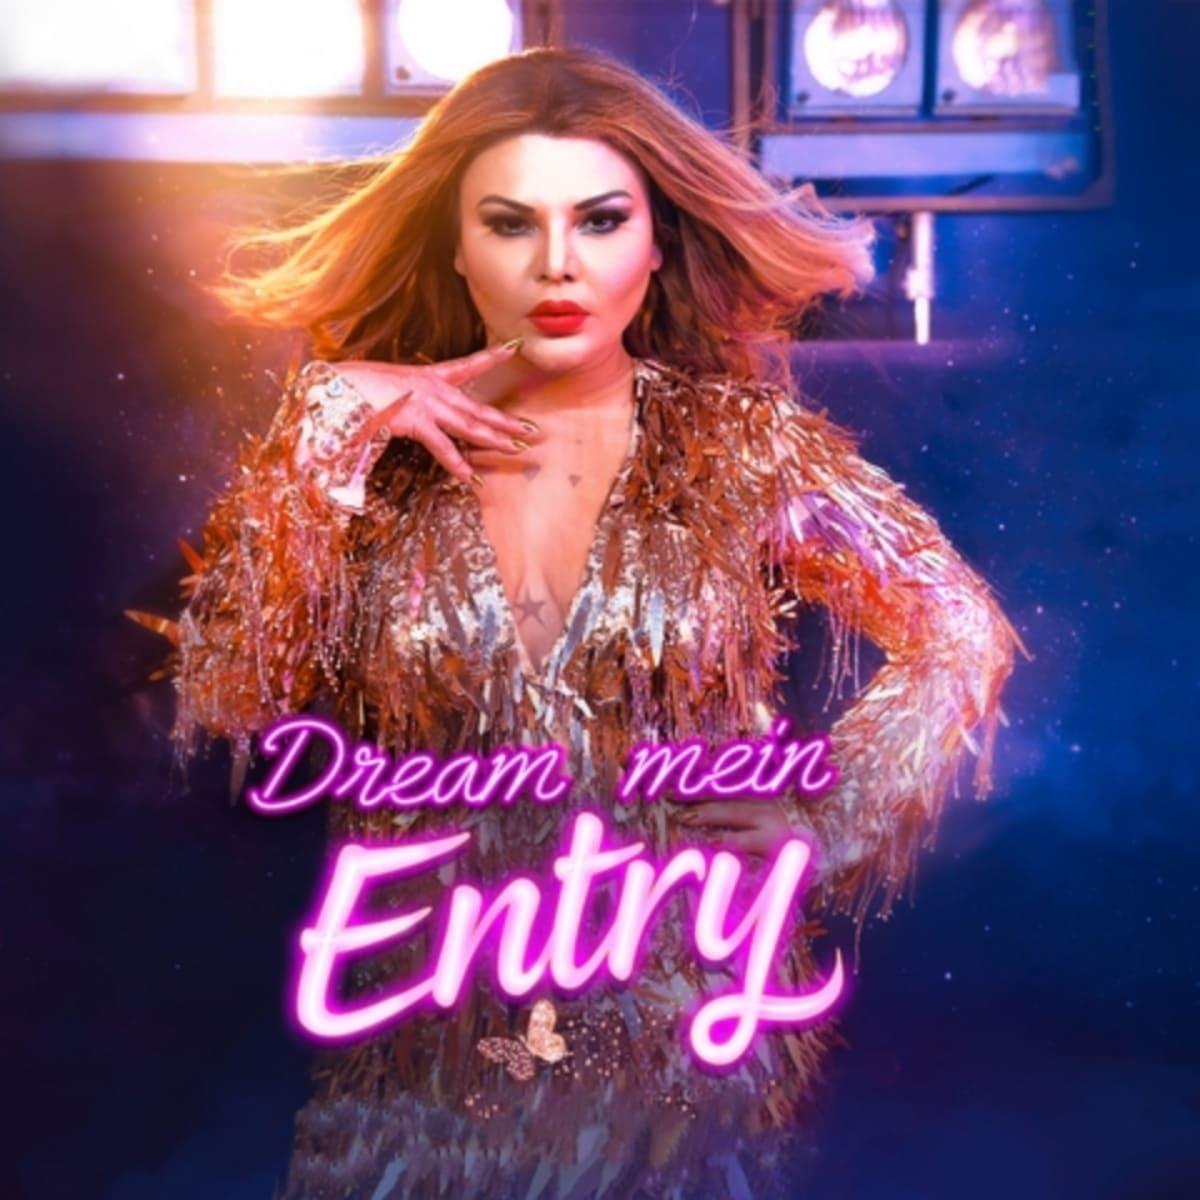 Dream Mein Entry Rakhi Sawant Mp3 Song Download 320kbps Free